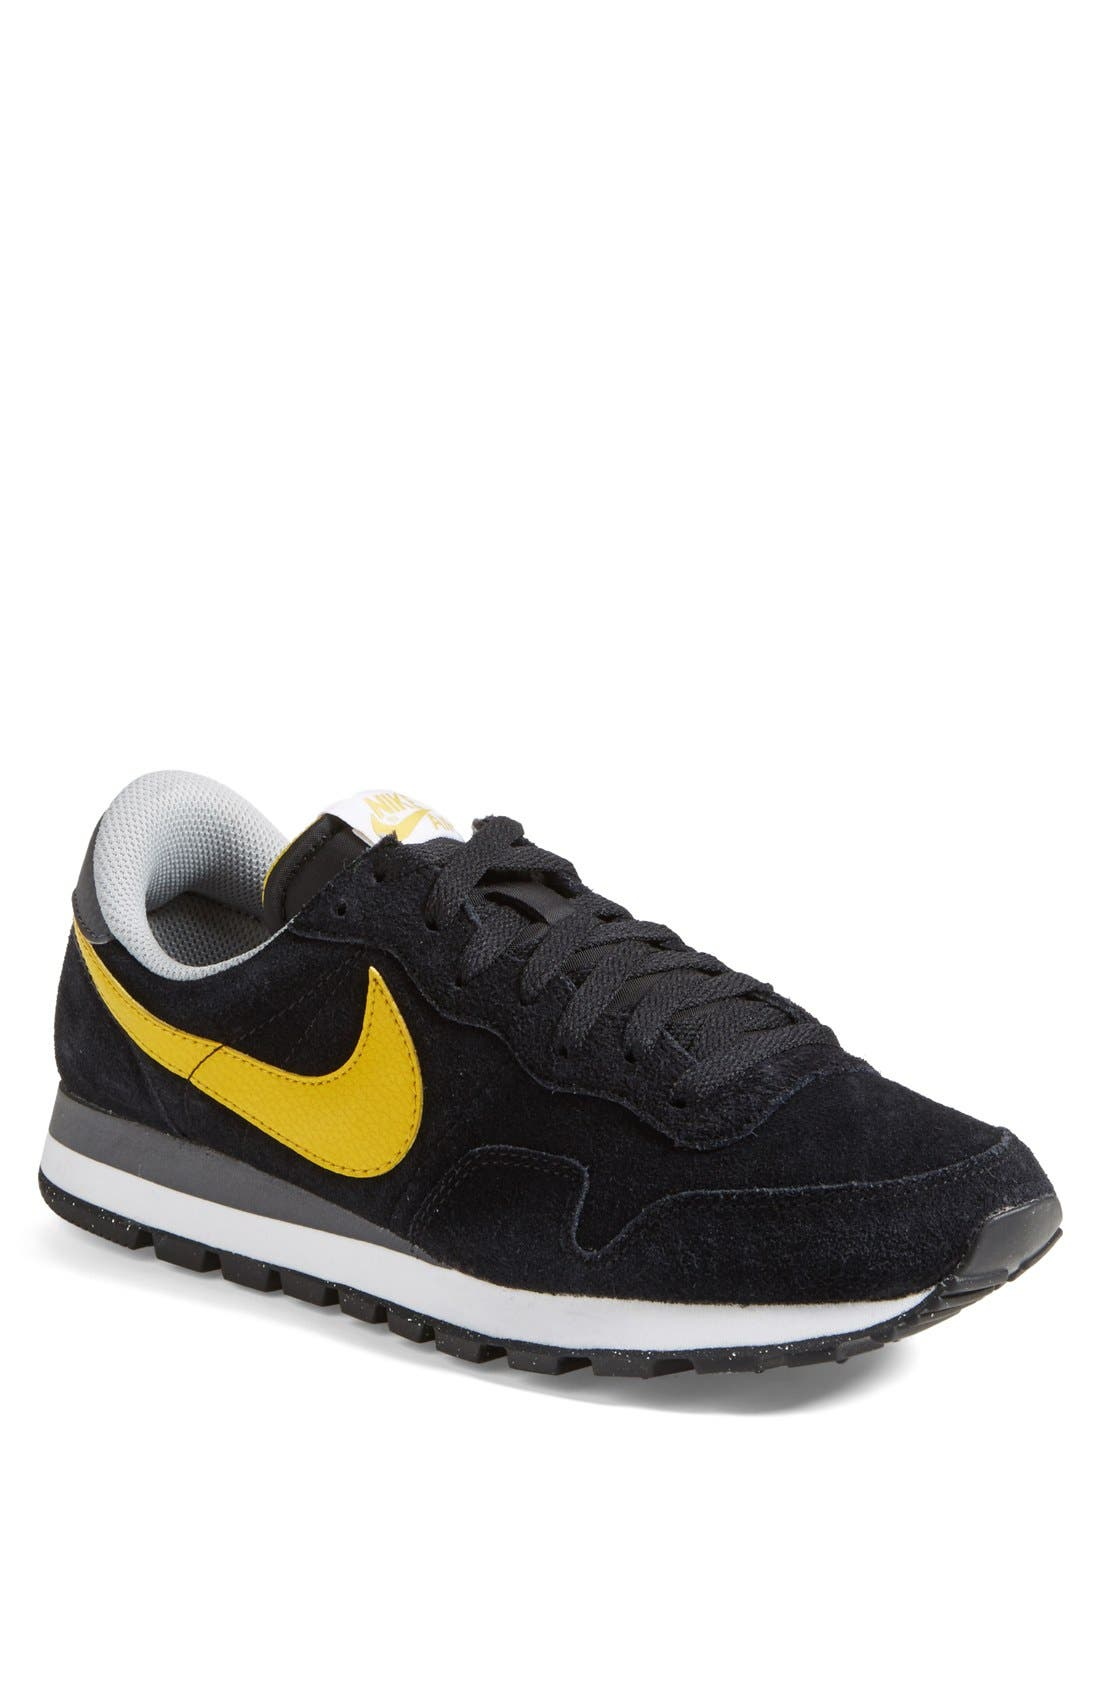 38e7e79d27810 authentic nike air pegasus 83 ltr grey black sneaker freaker 94a97 7d2ff   store air pegasus 83 ltr sneaker d7785 c8fe5